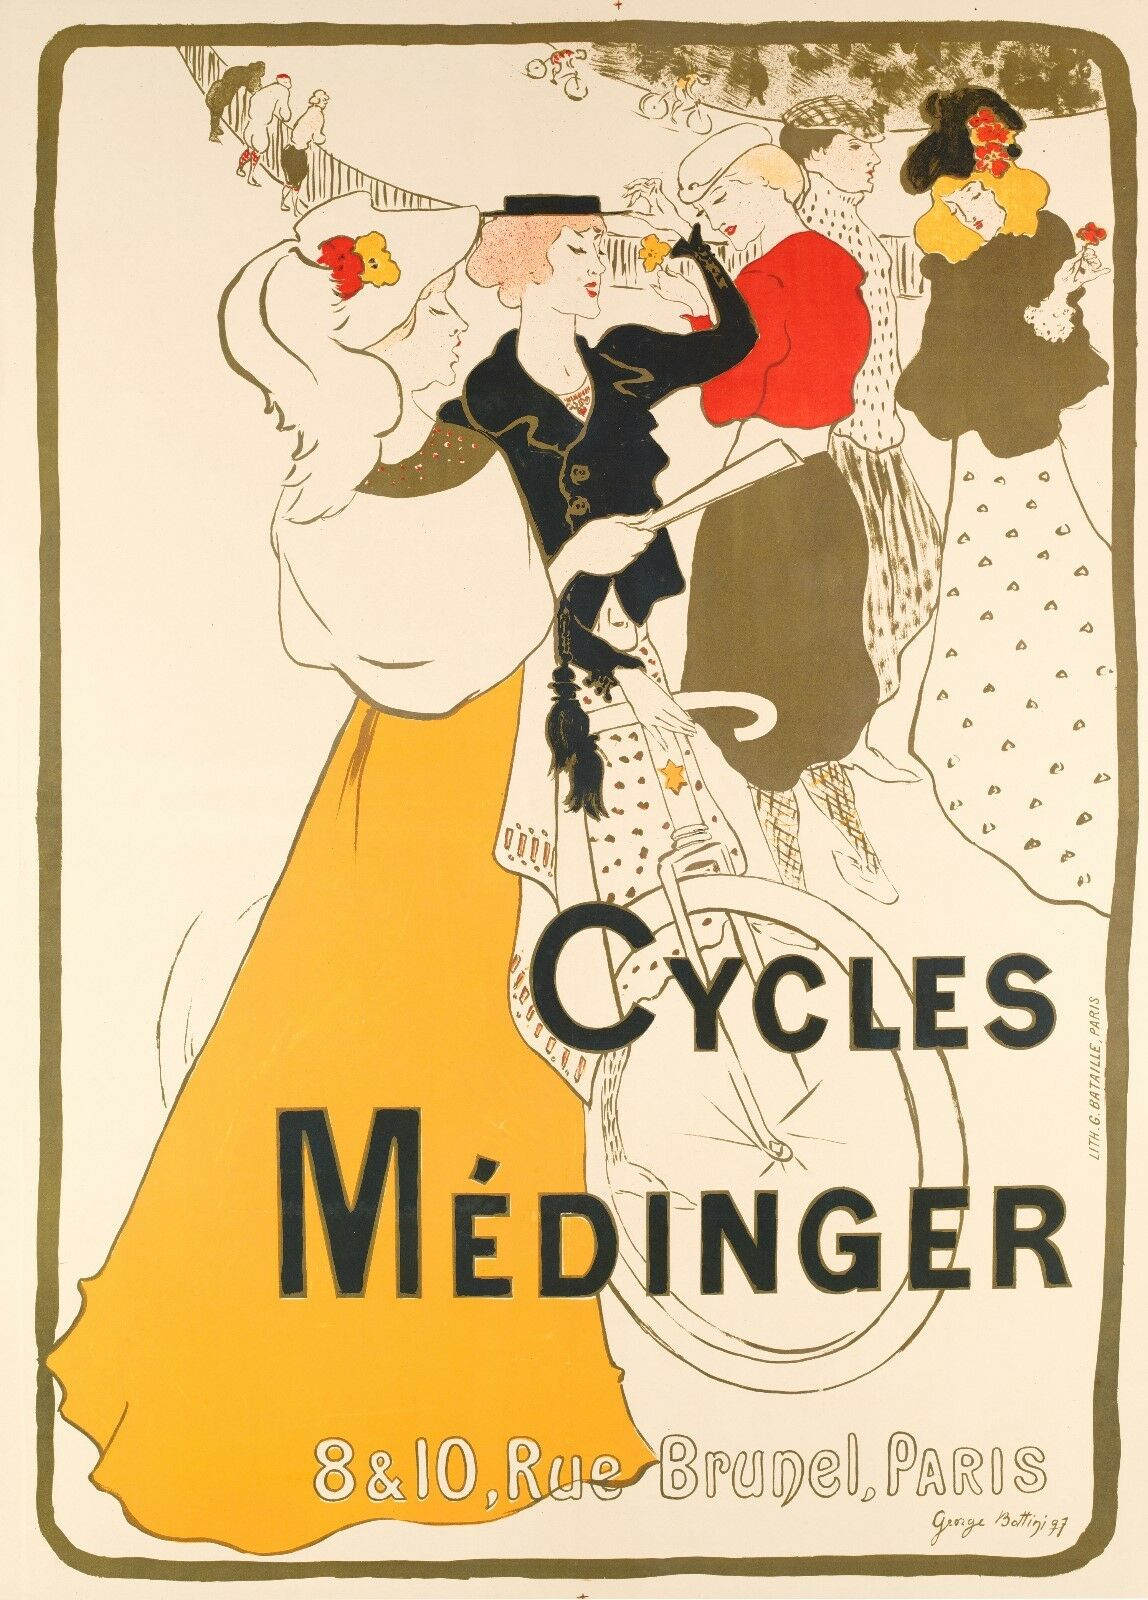 Original Vintage Bicycle Poster - George Bottini - Cycles Medinger - Paris 1897 (Used - 8800 USD)